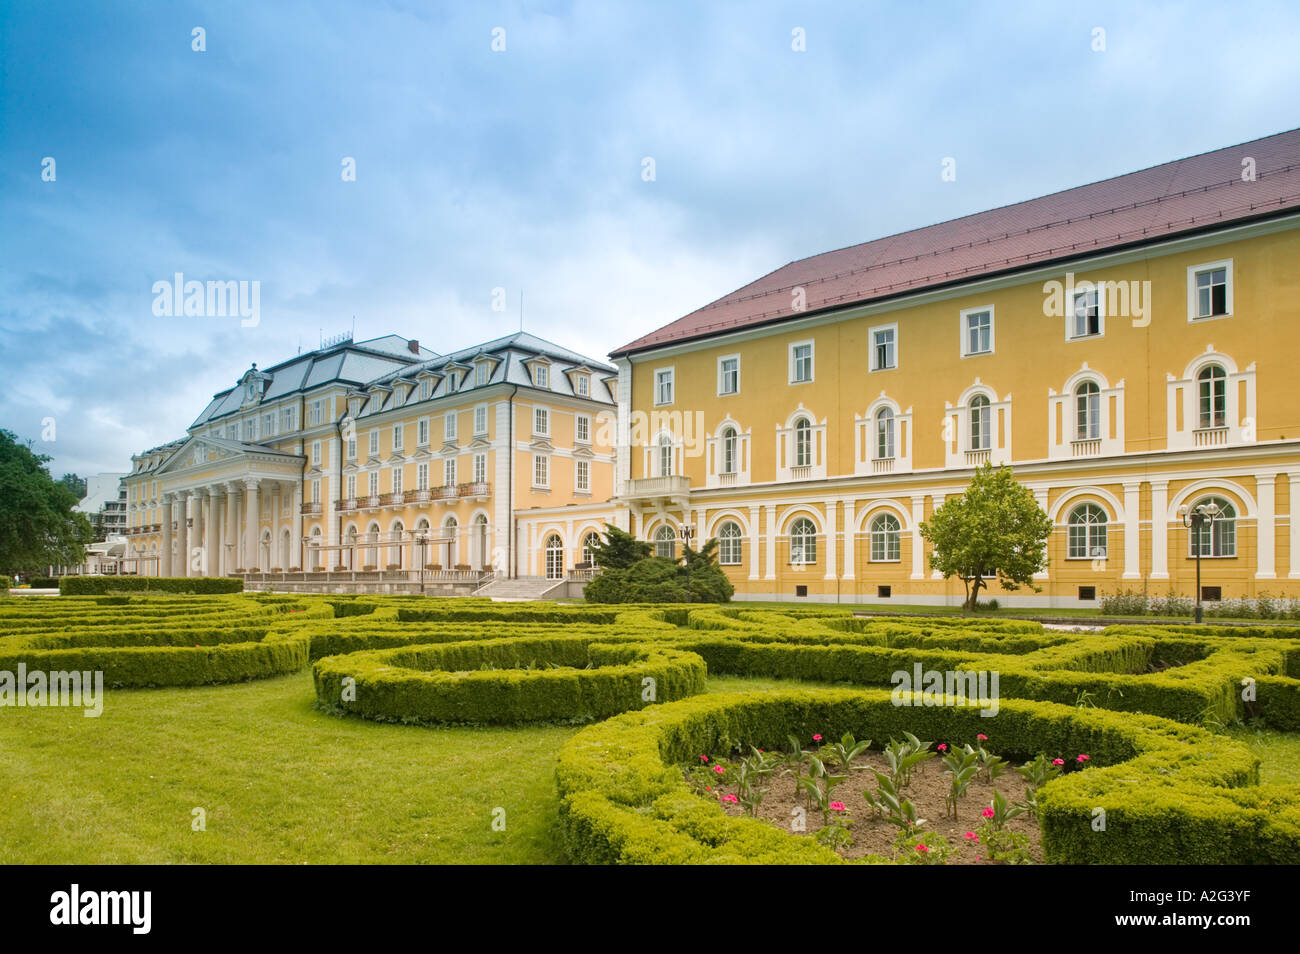 Slovenia stajerska rogaska slatina spa hotels for Wellness hotel slovenia